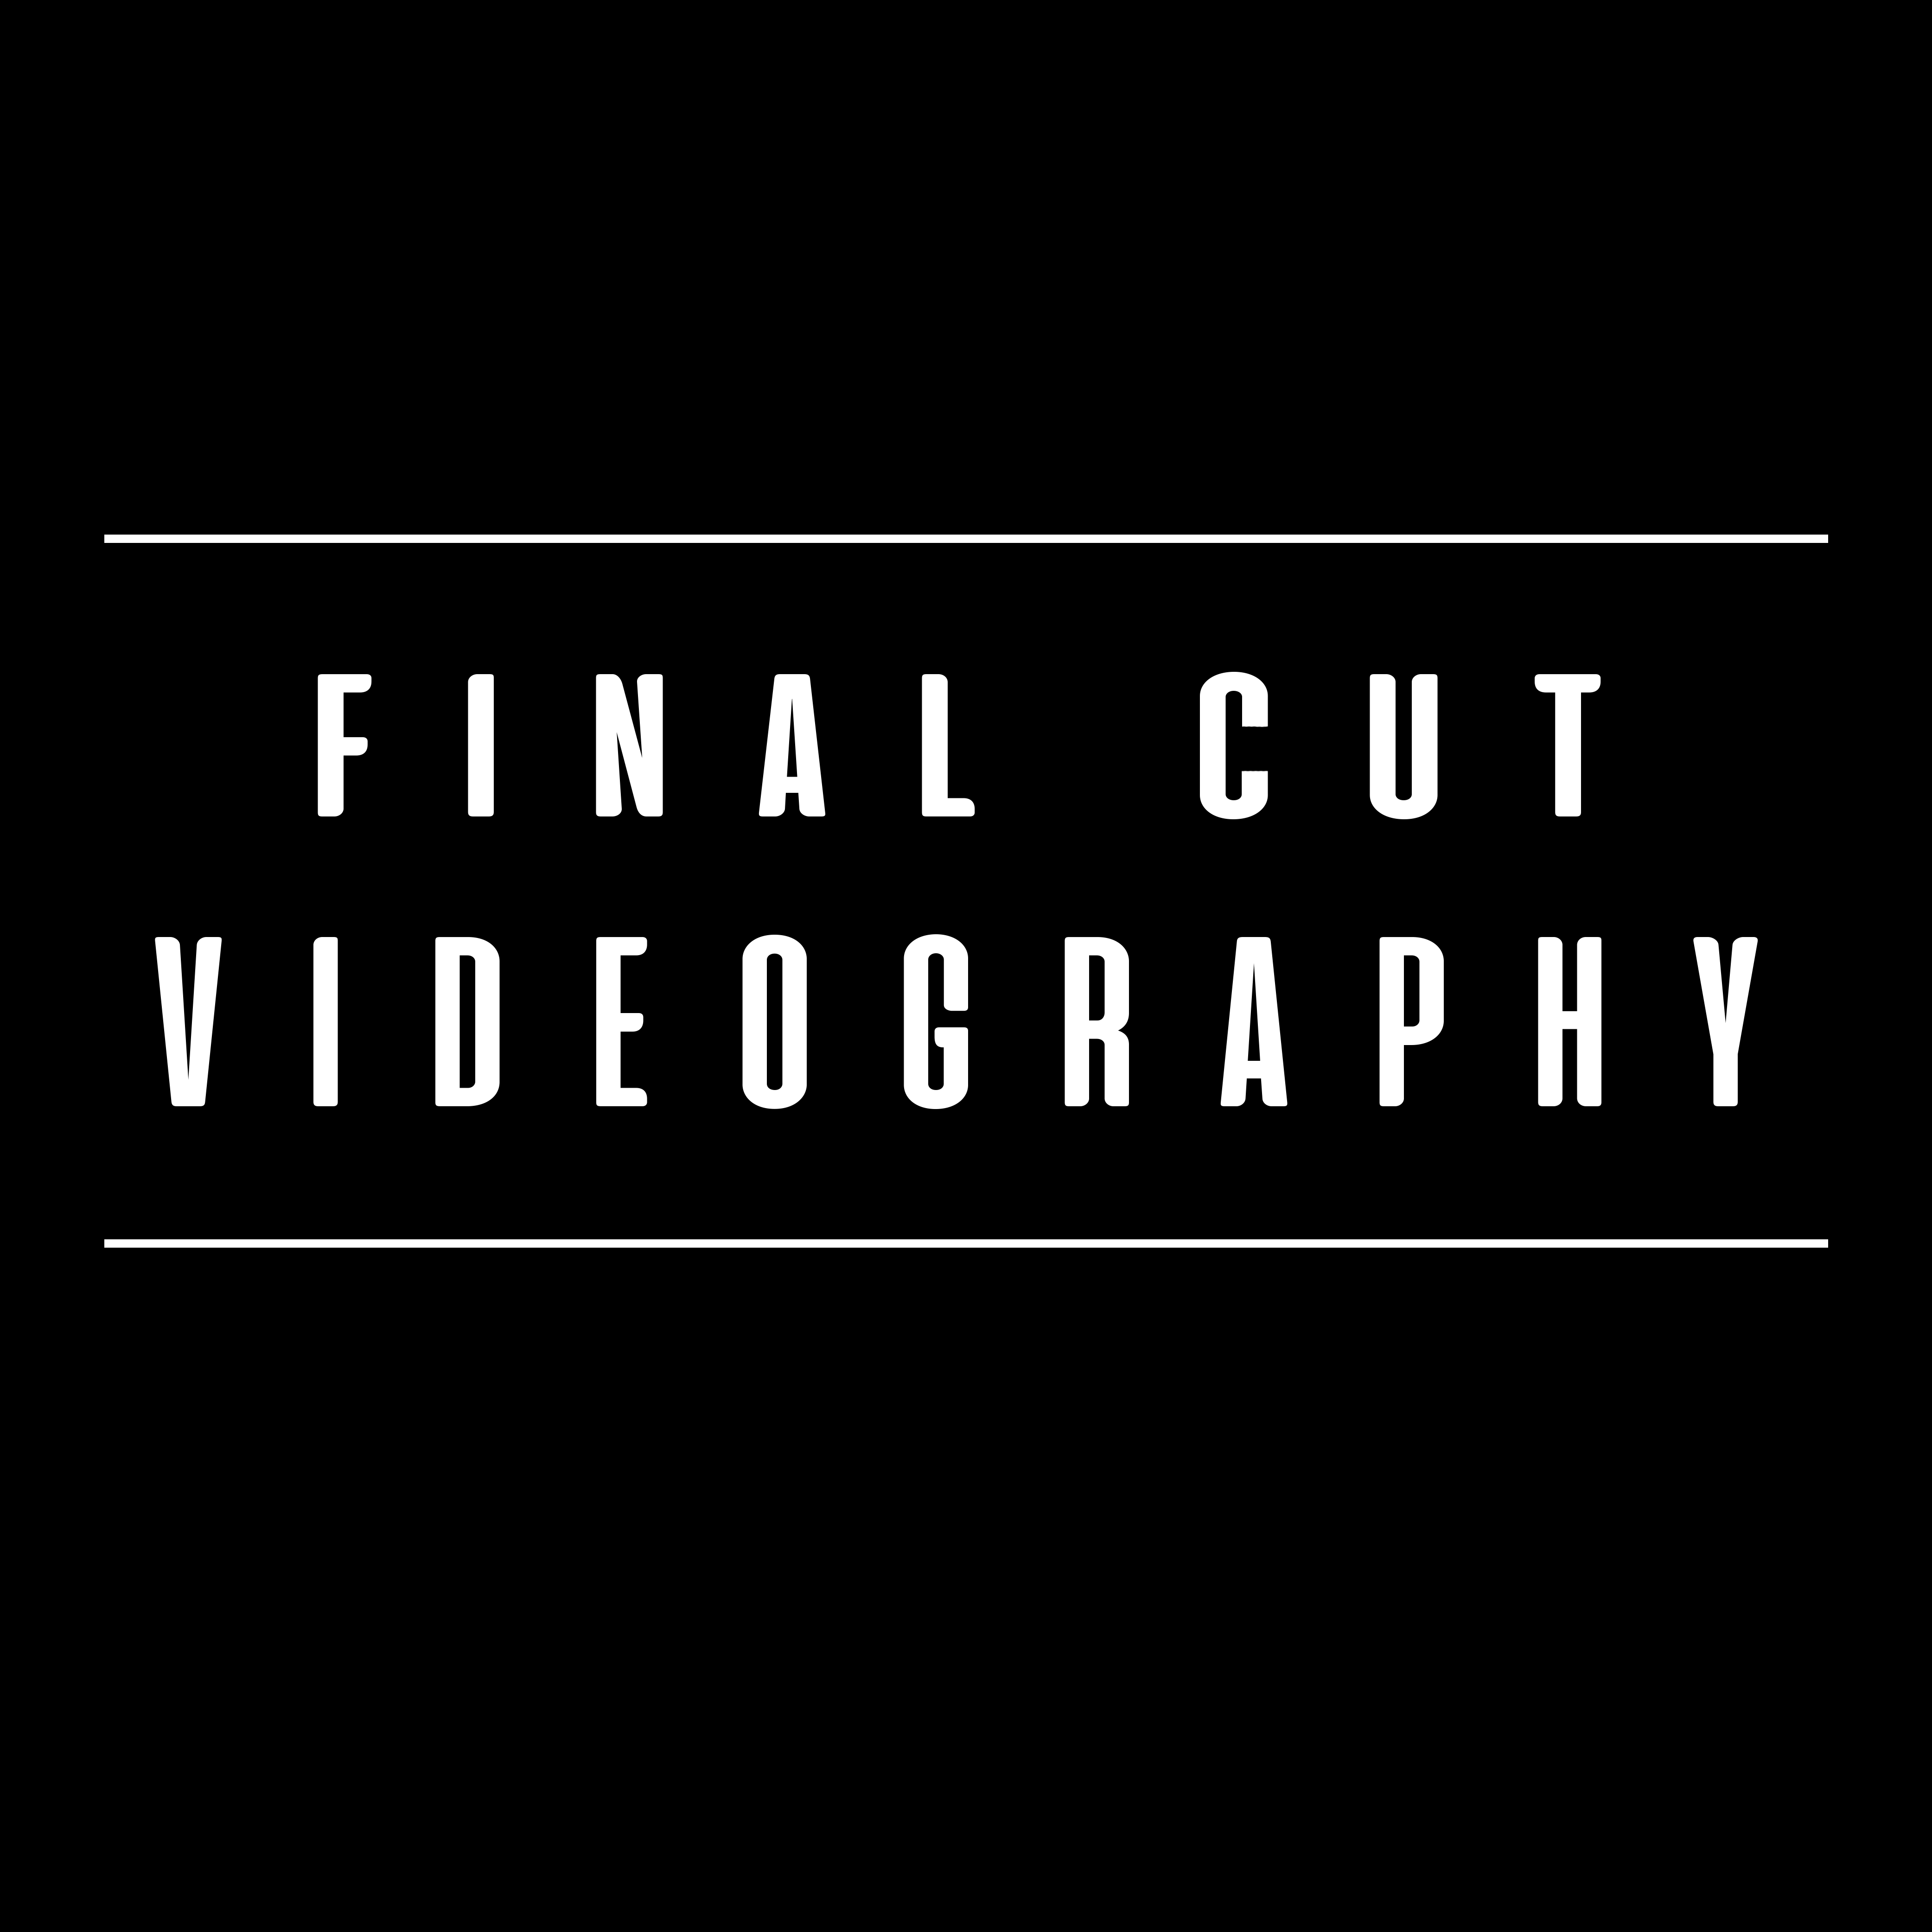 fcv final cut videography collaborator emkew mq 2021 hip hop music video